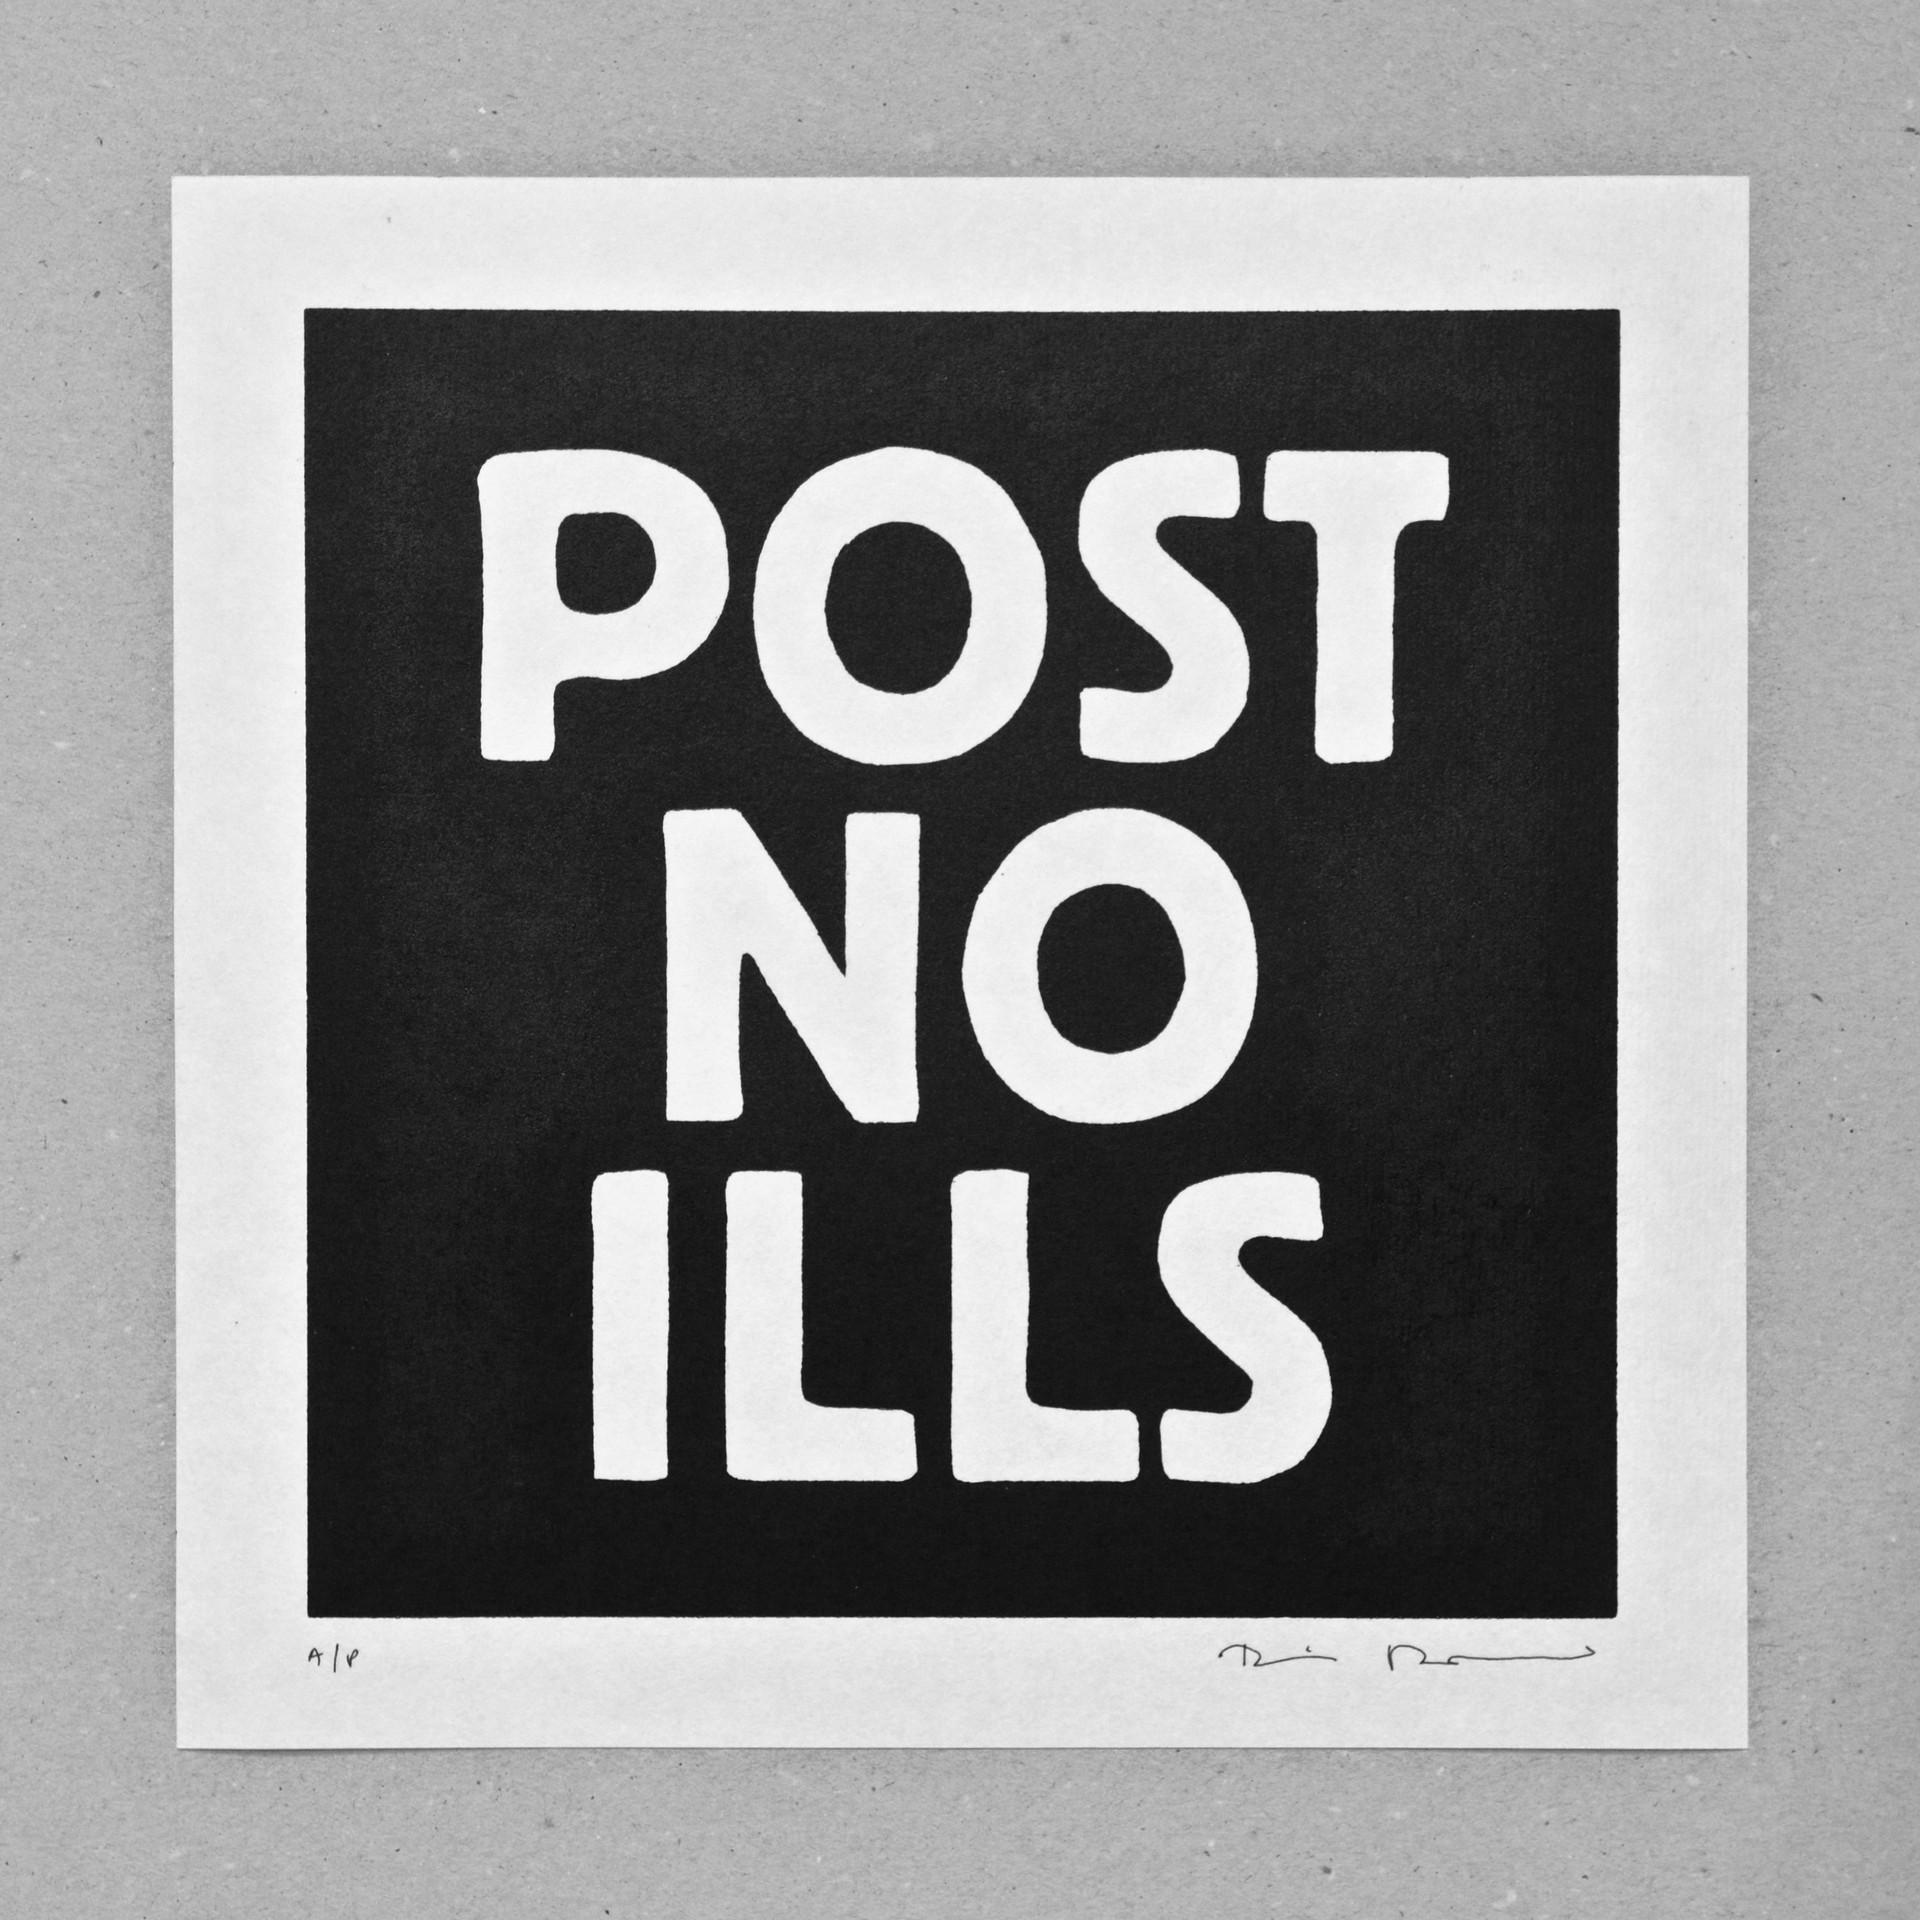 POST_NO_ILLS.jpg